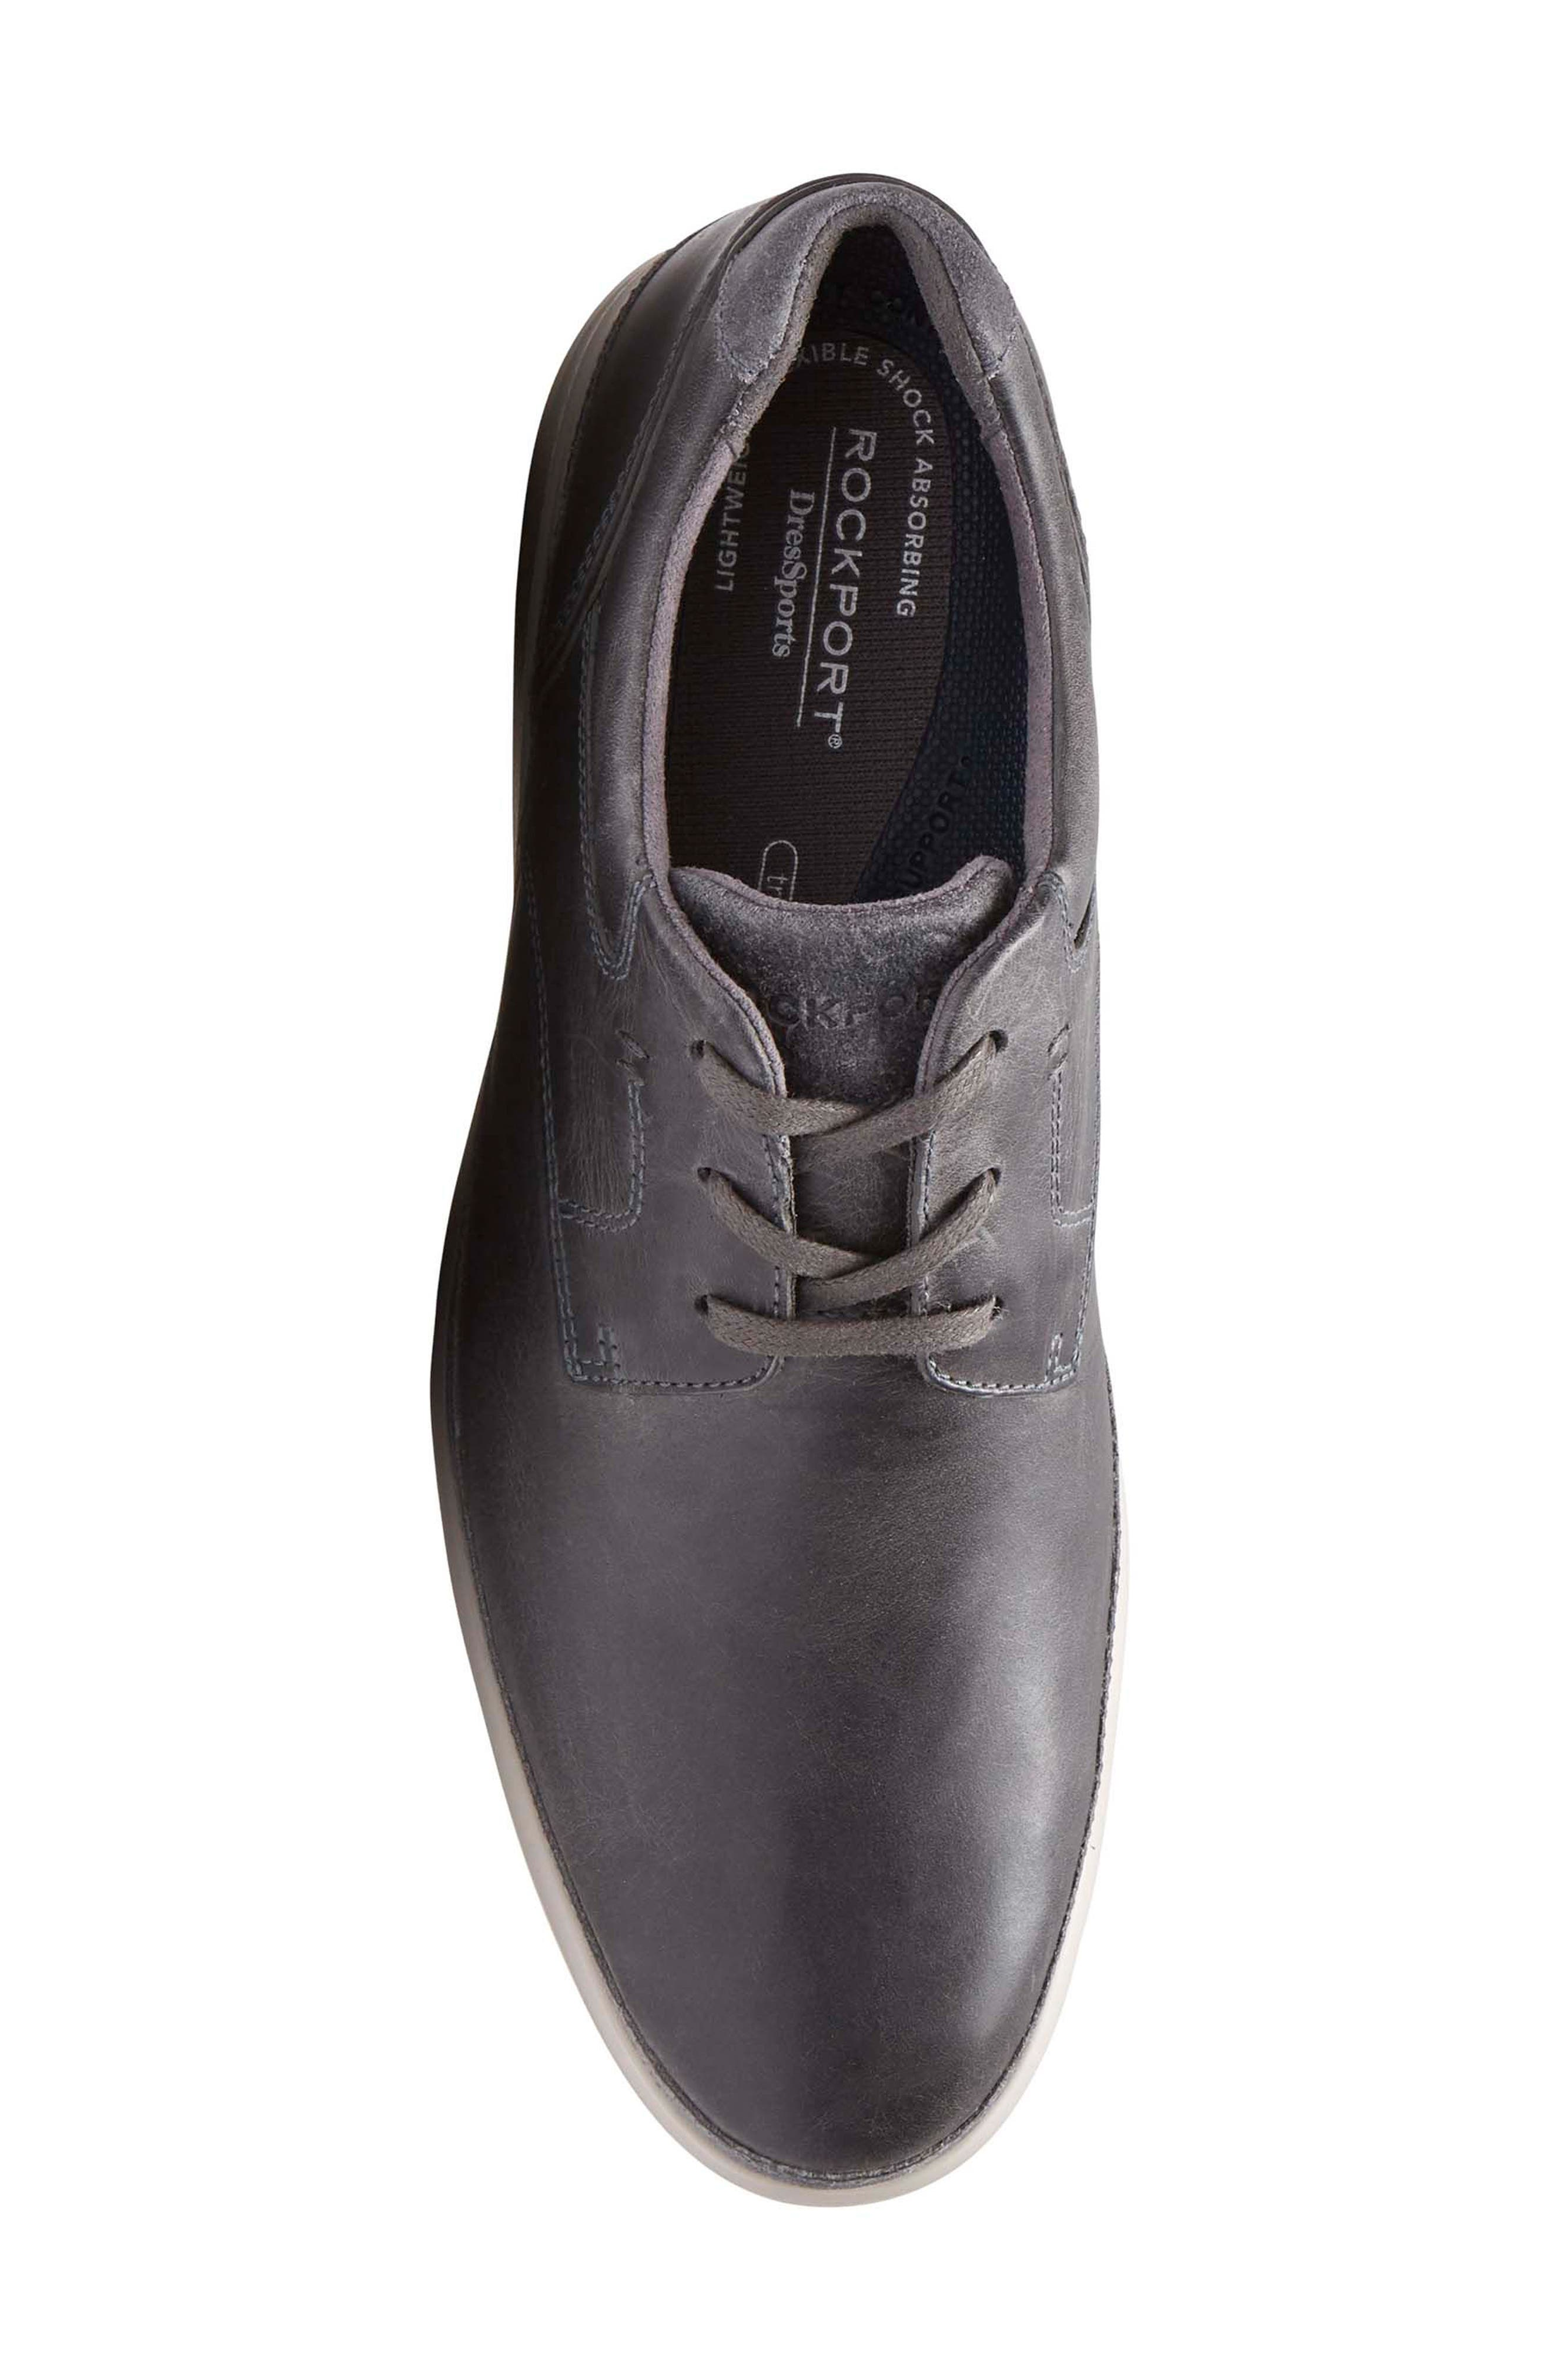 Dressports 2 Go Plain Toe Derby,                             Alternate thumbnail 5, color,                             Grey Leather